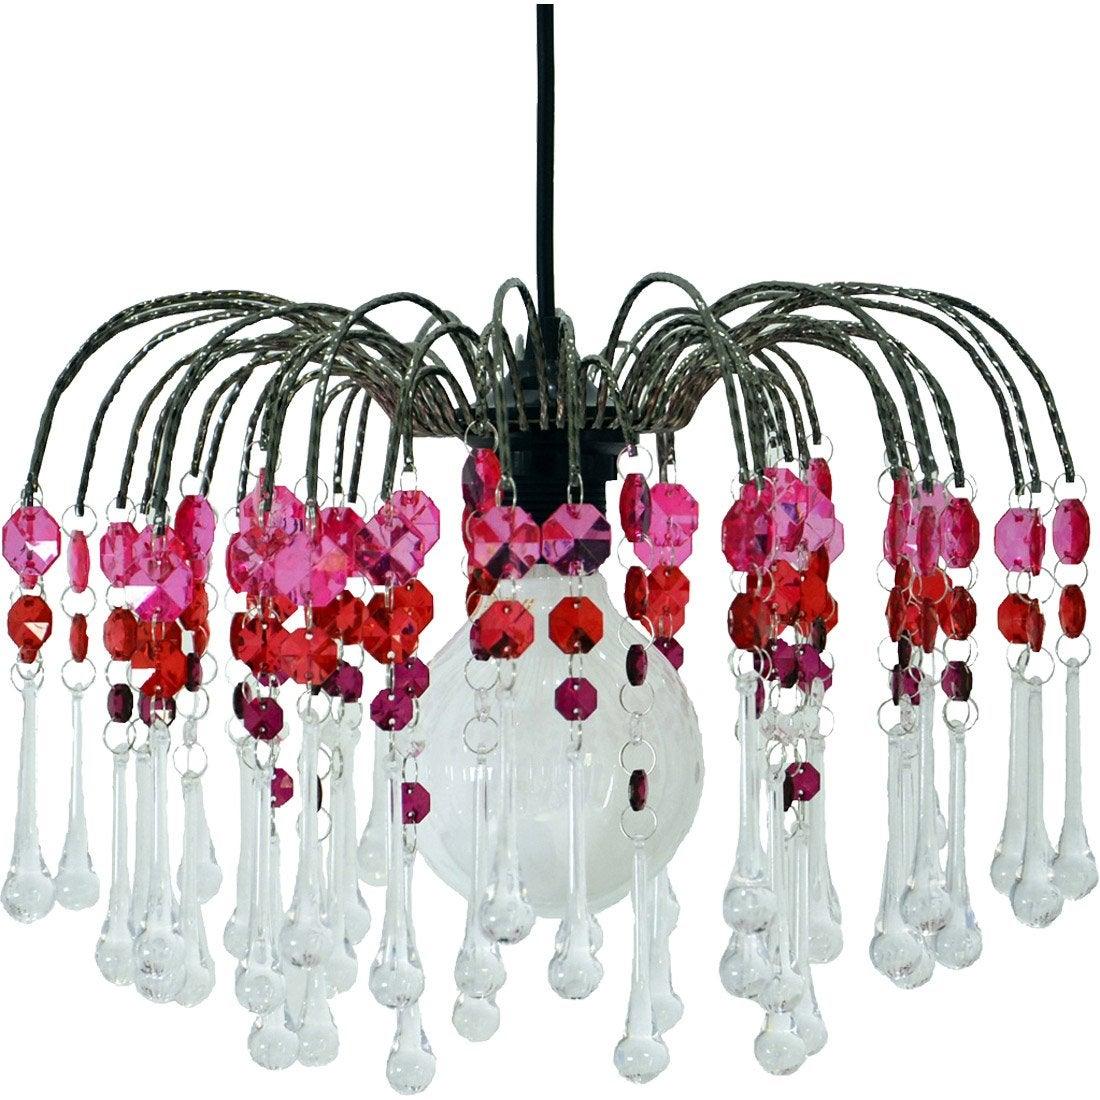 suspension baroque mikonos acrylique rose et blanc 1 x 60 w boudet leroy merlin. Black Bedroom Furniture Sets. Home Design Ideas